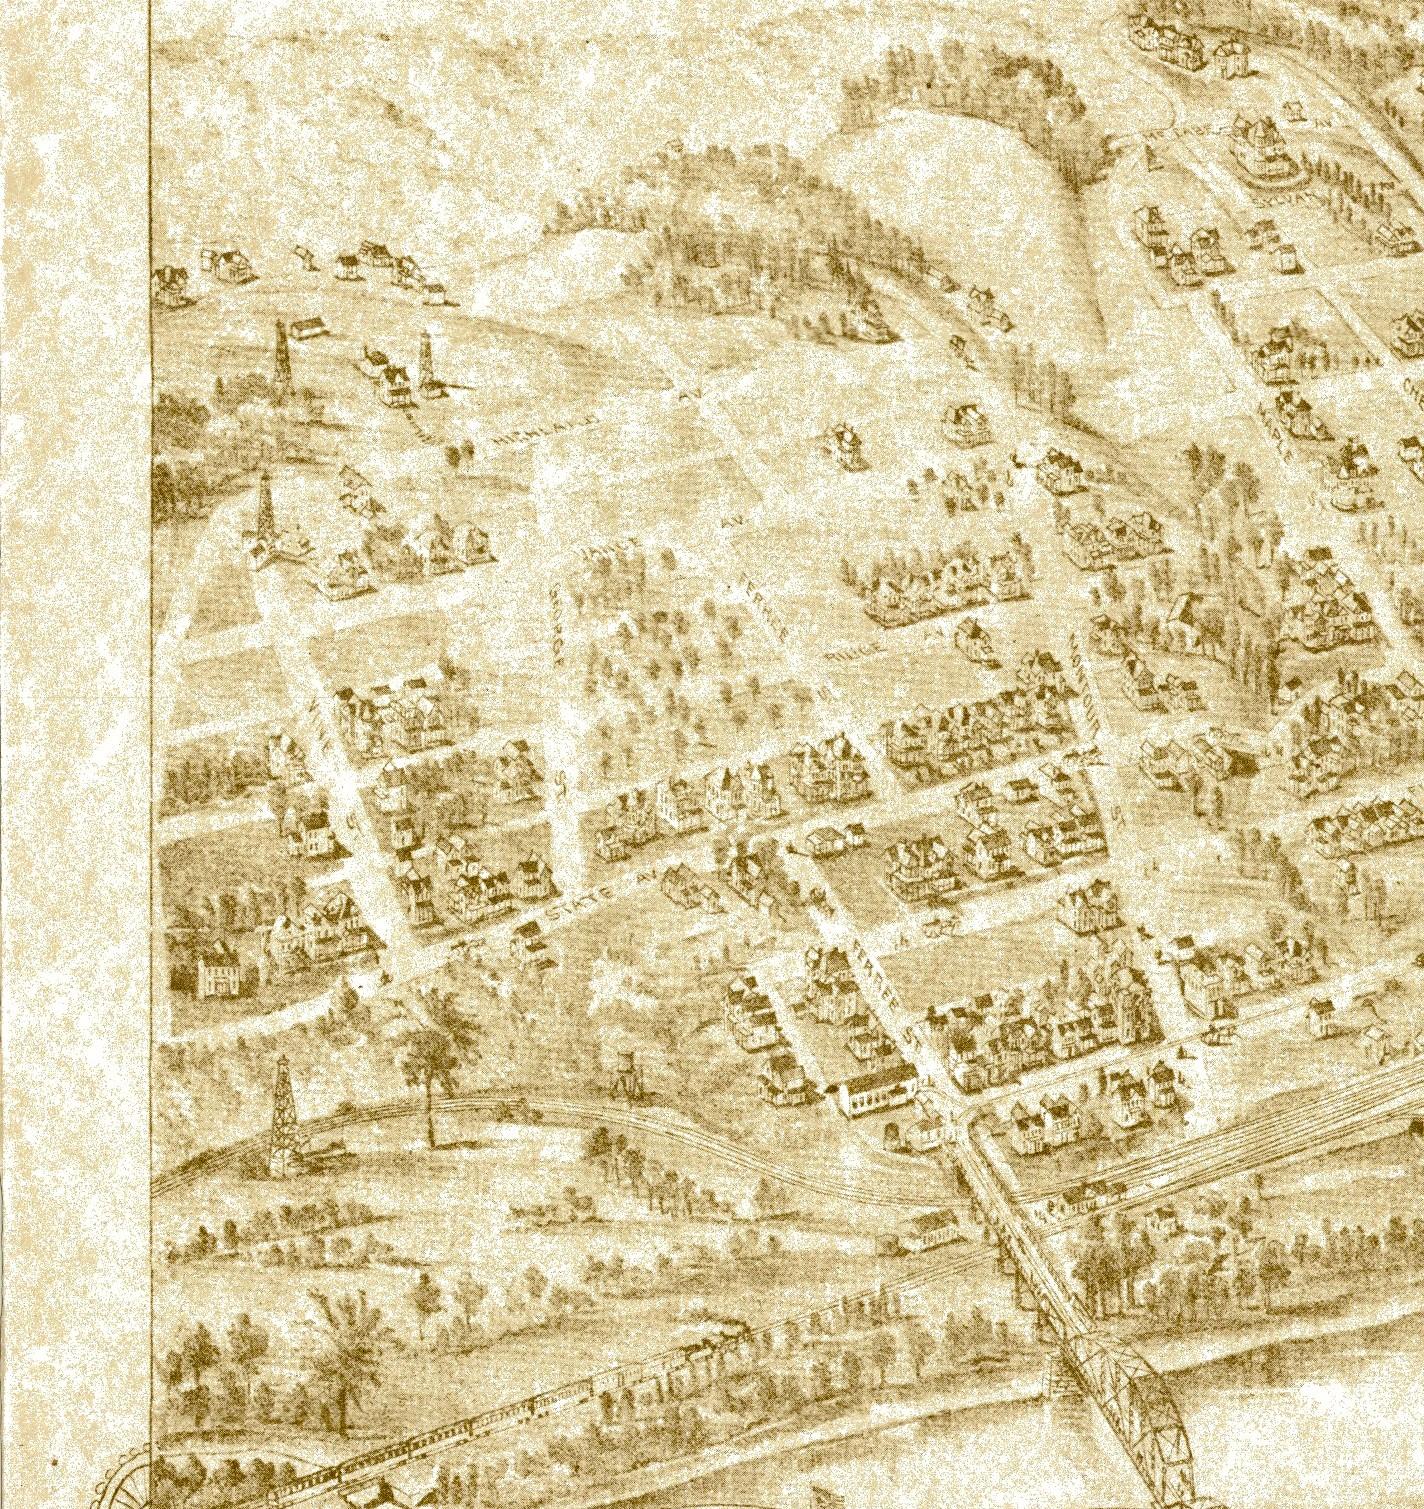 map-75(2A).jpg